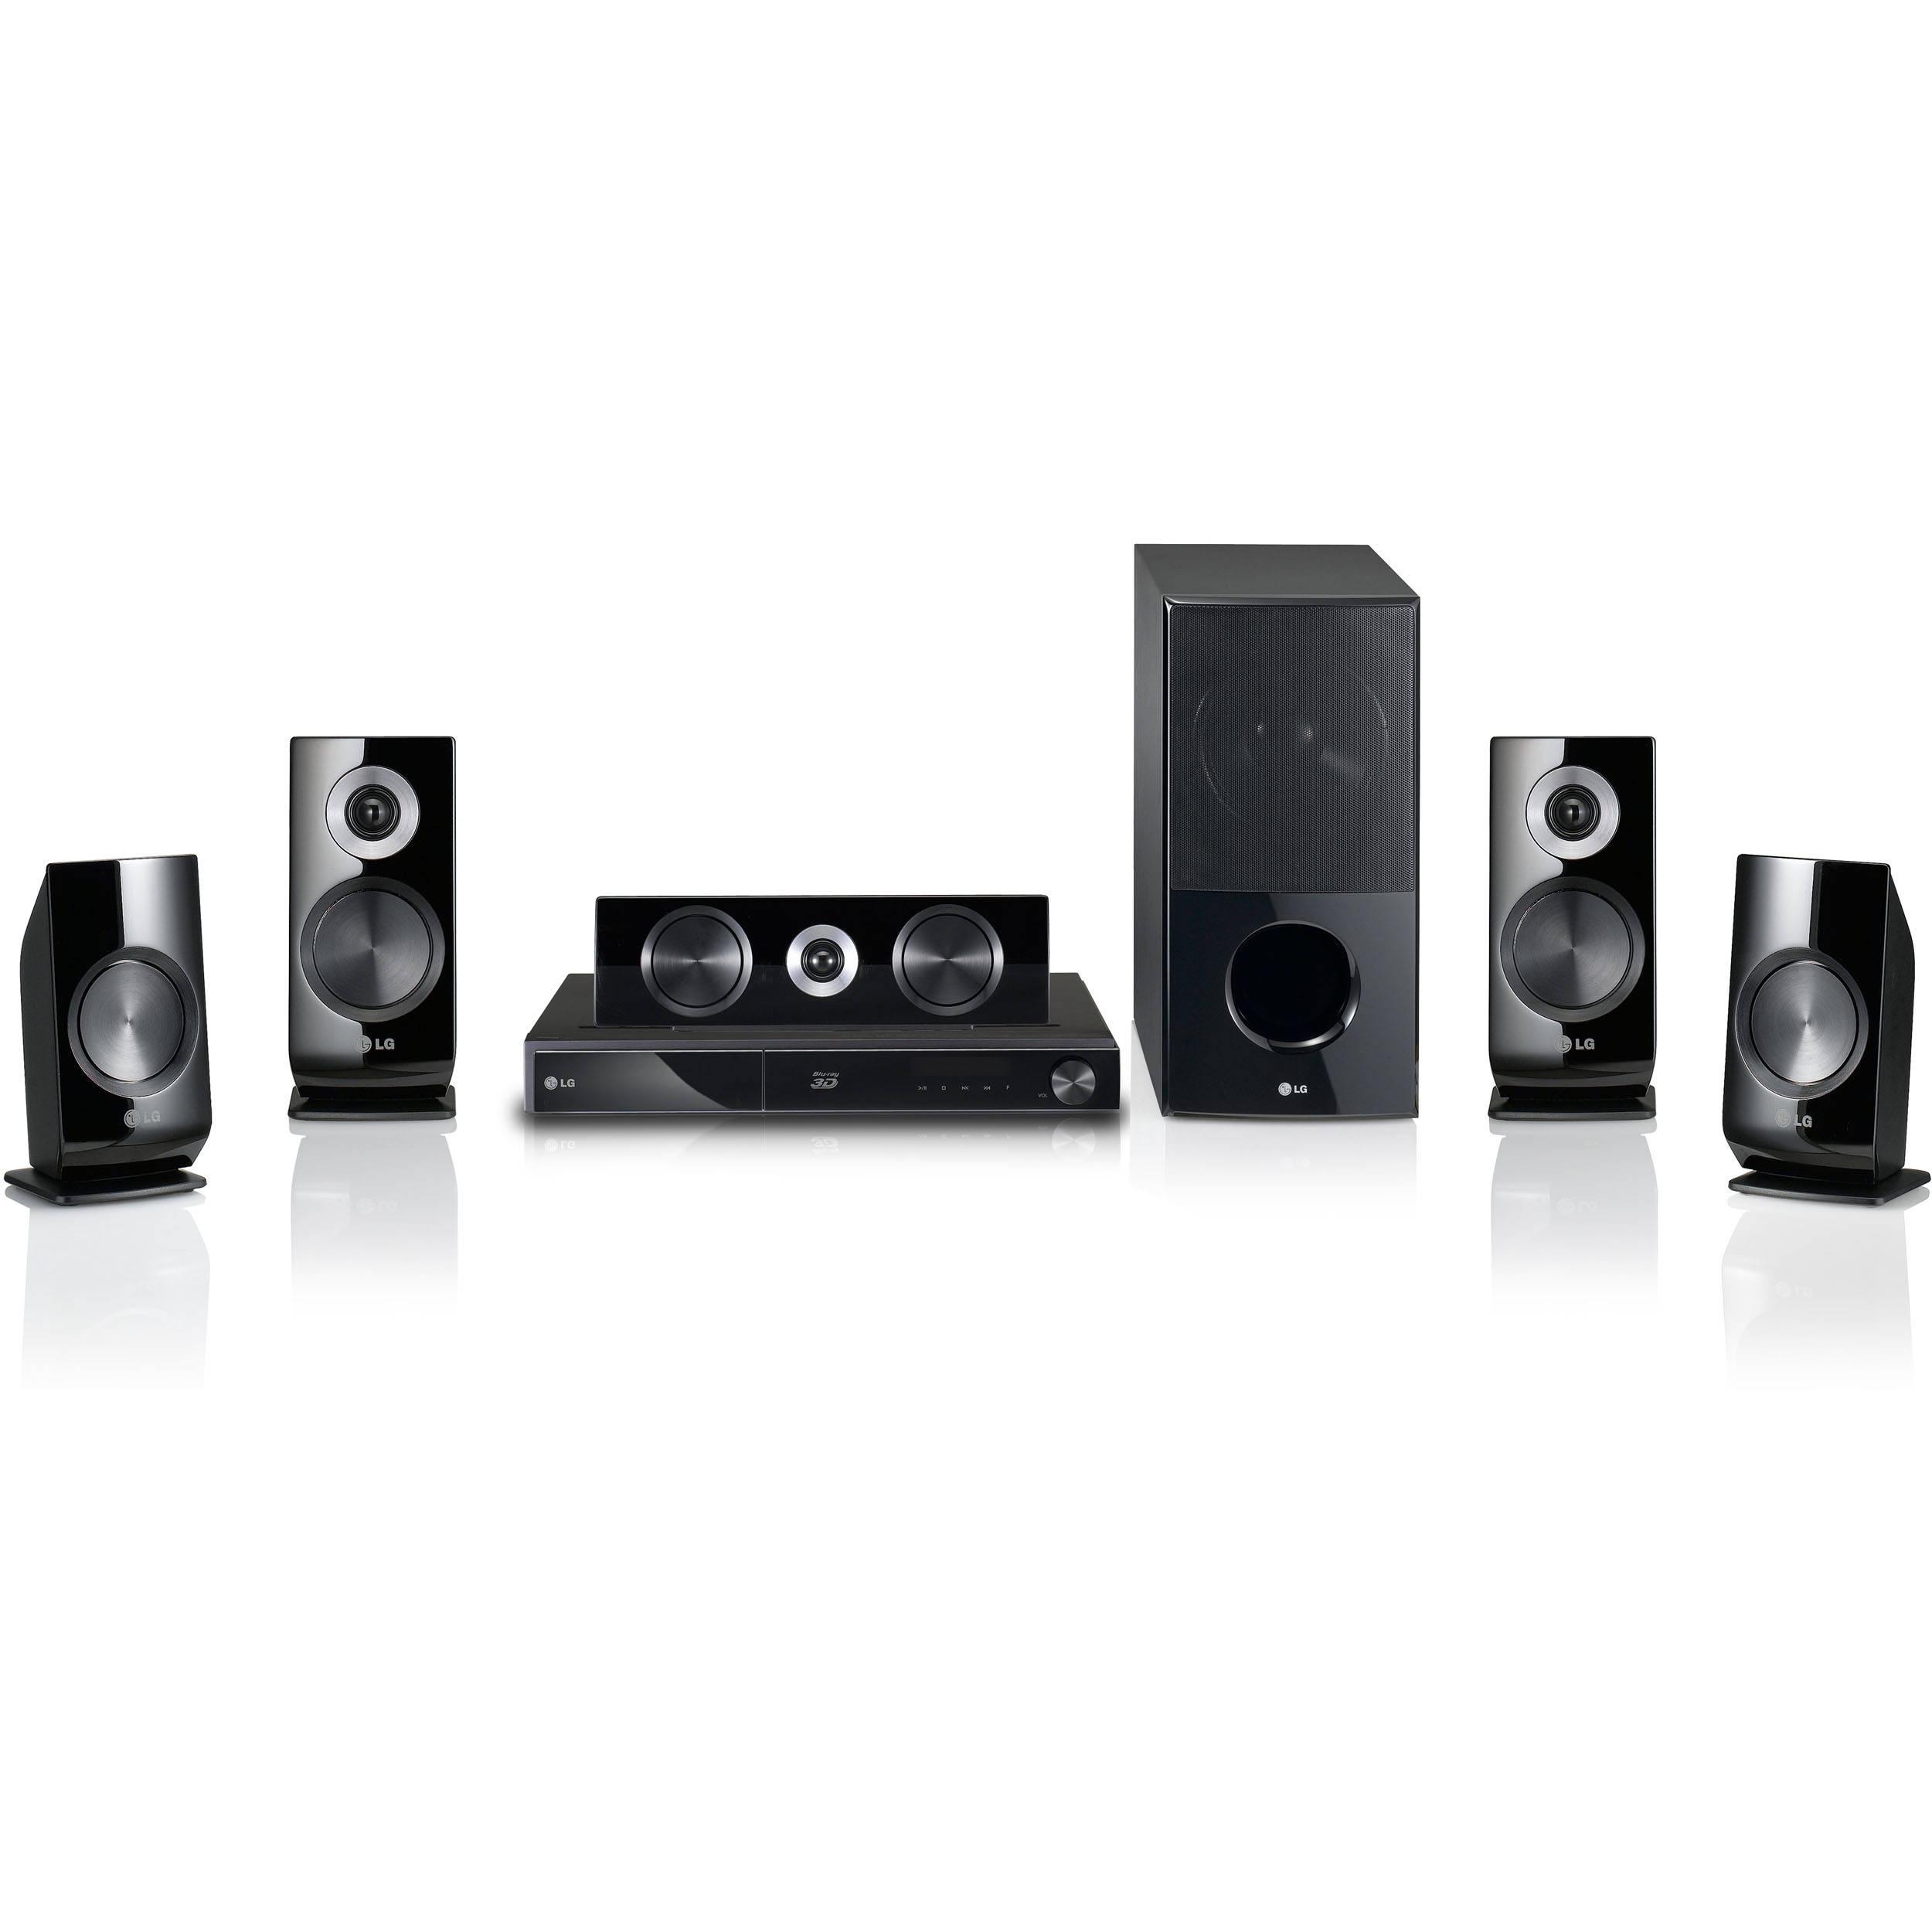 LG LHB536 Network 3D Blu-ray Home Theater System LHB536 B&H